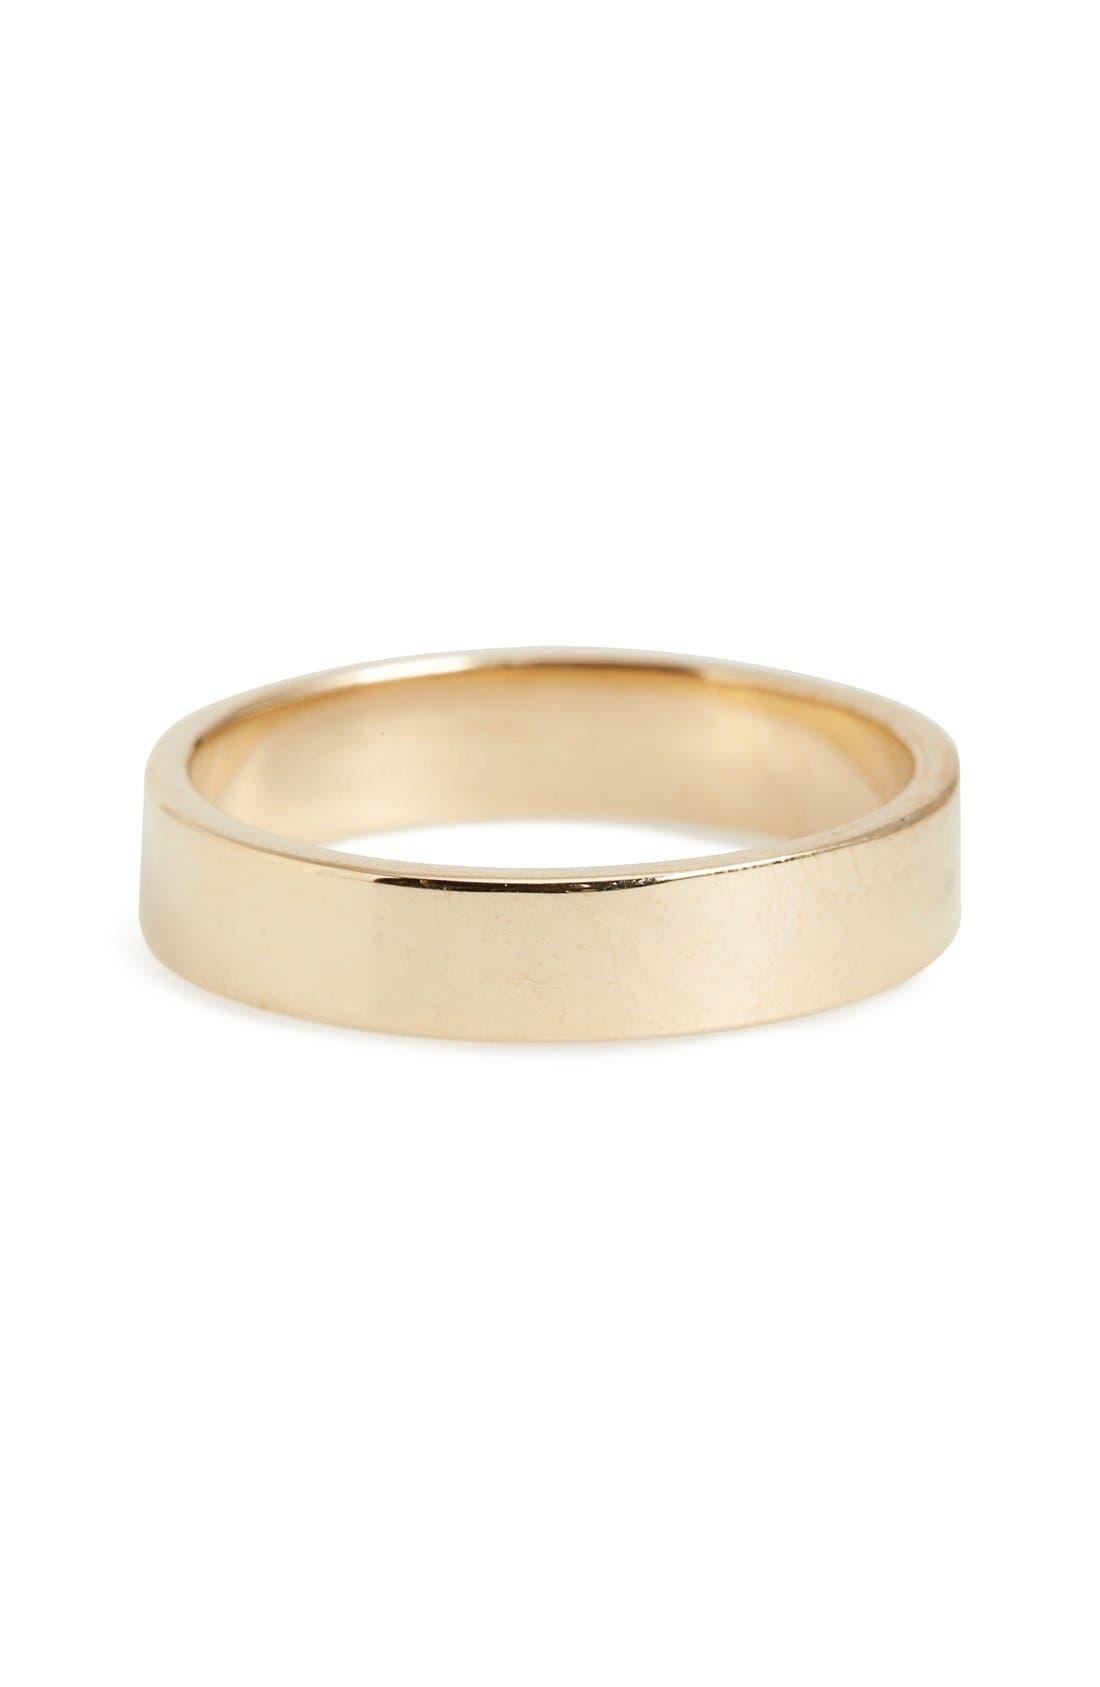 Harmony<sup>®</sup> Flat Classic 4mm Shiny Band Ring,                             Main thumbnail 1, color,                             710